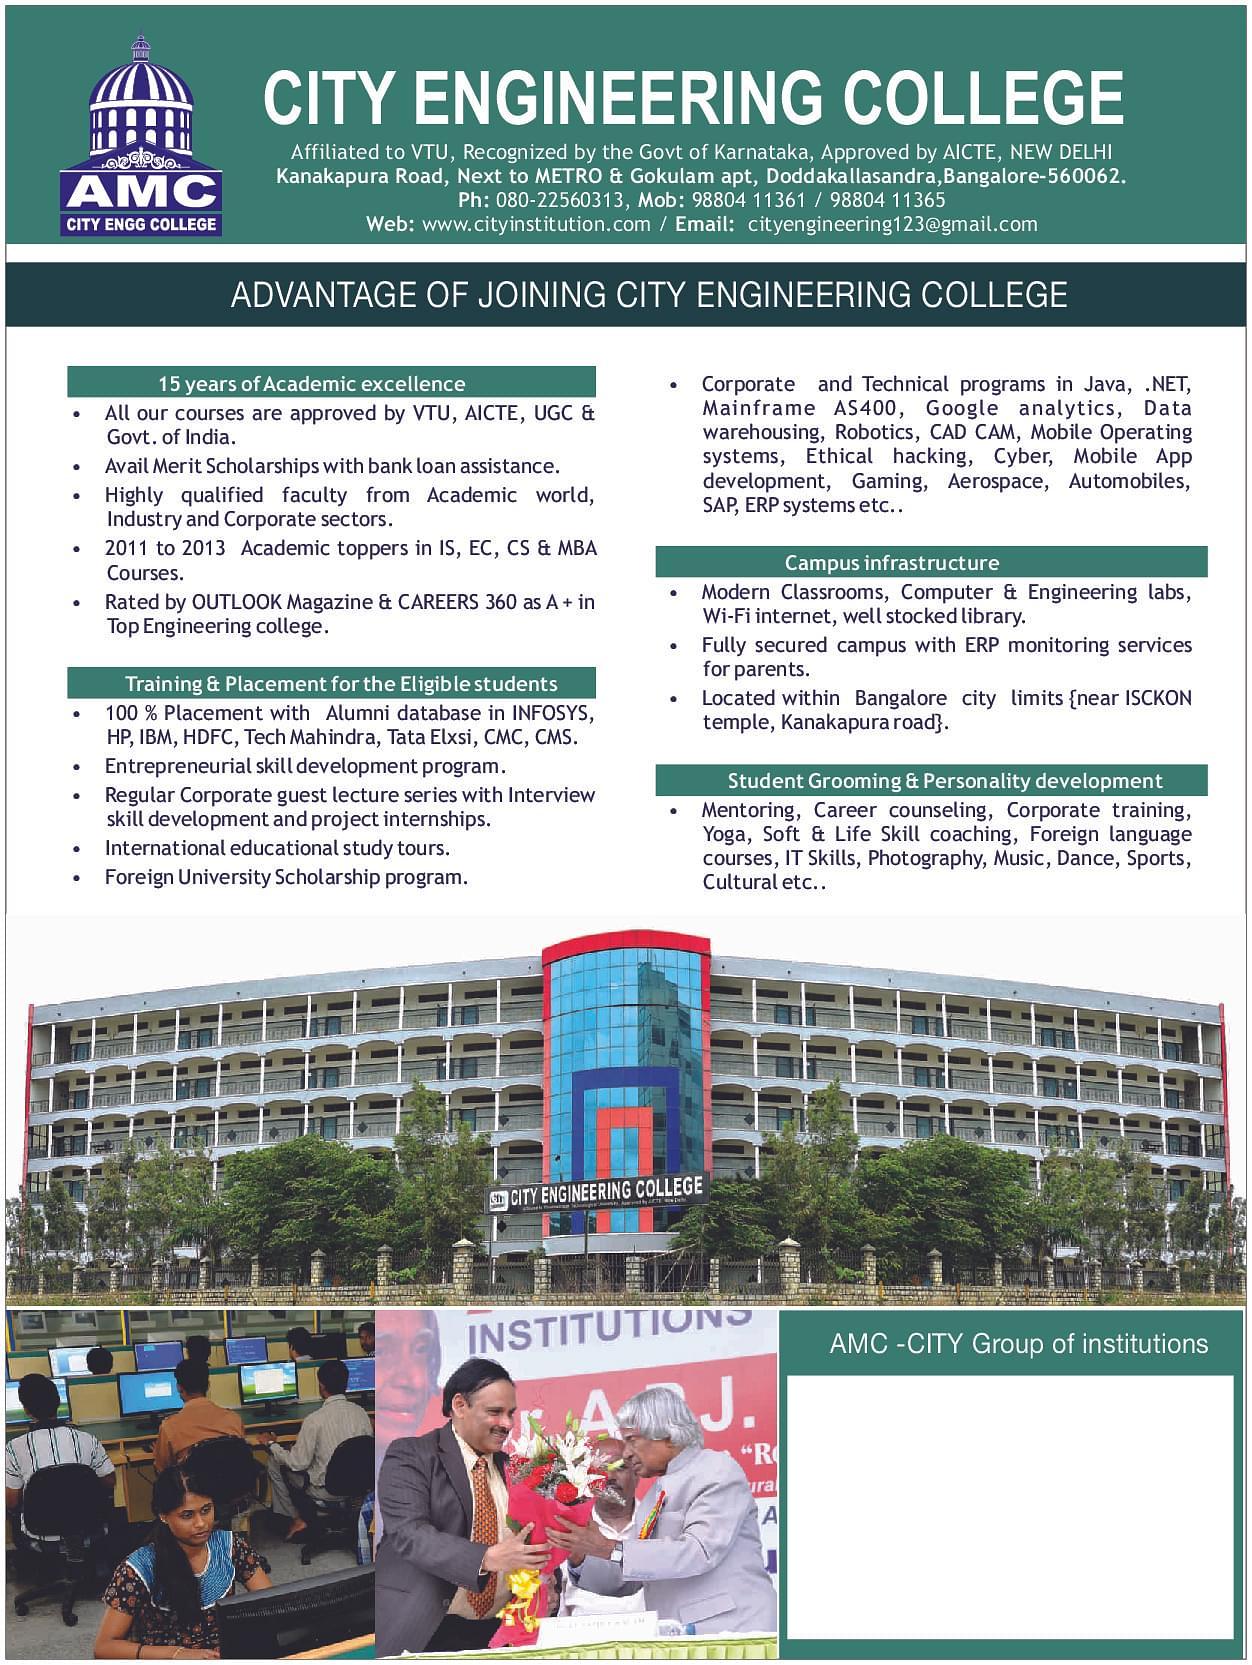 engineering college brochure design - city engineering college cec bangalore admissions